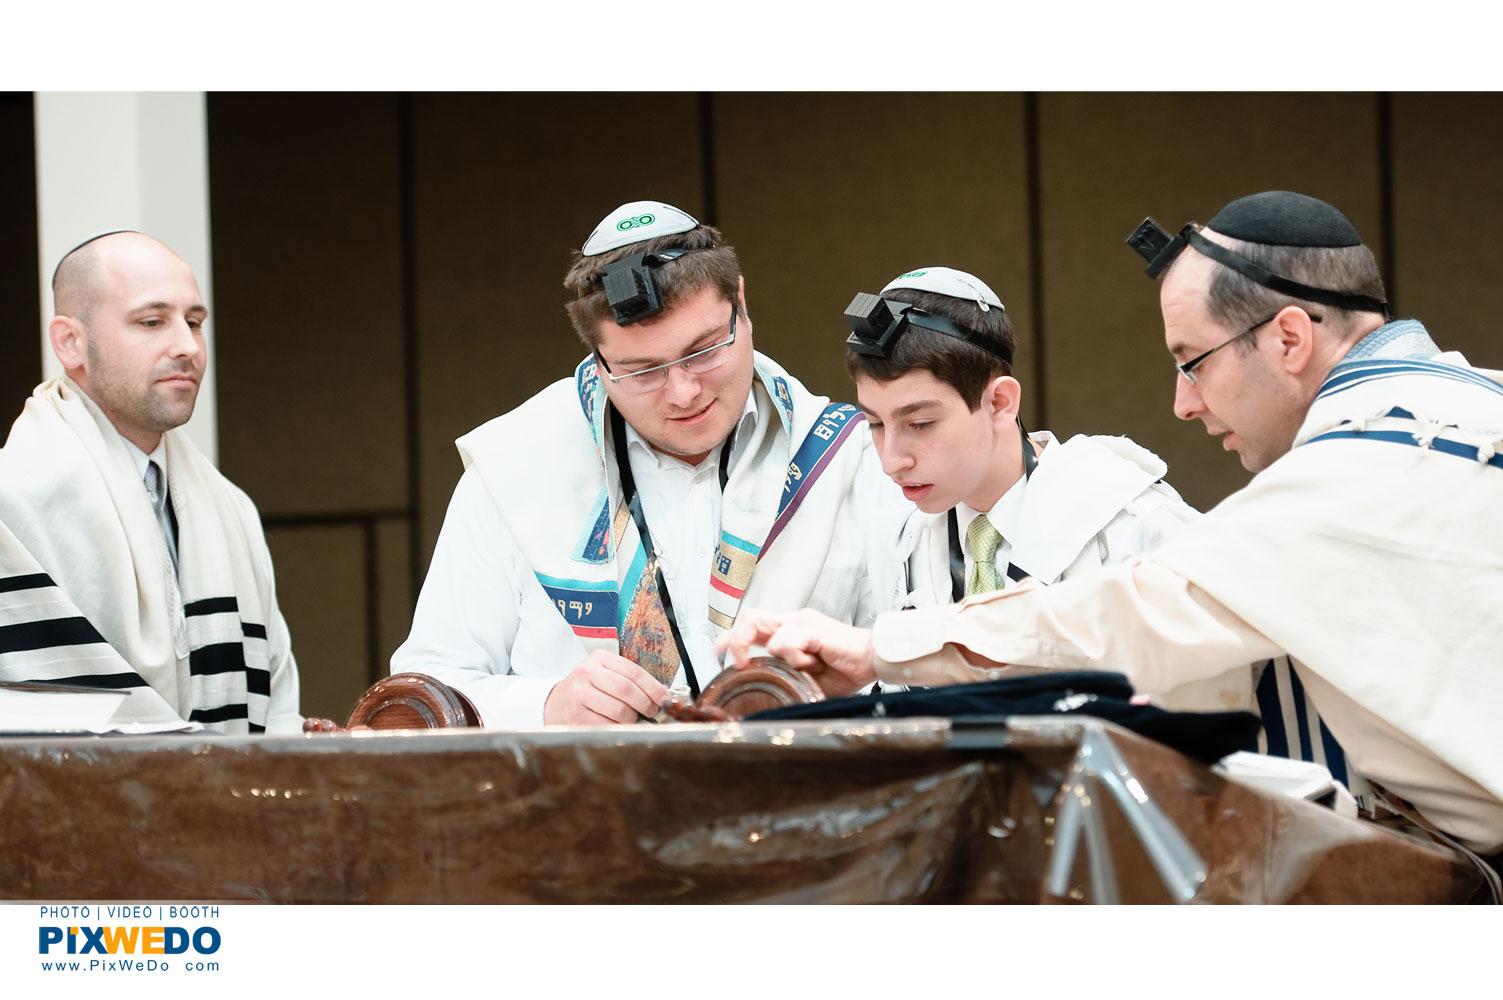 Bar Mitzvah service photography